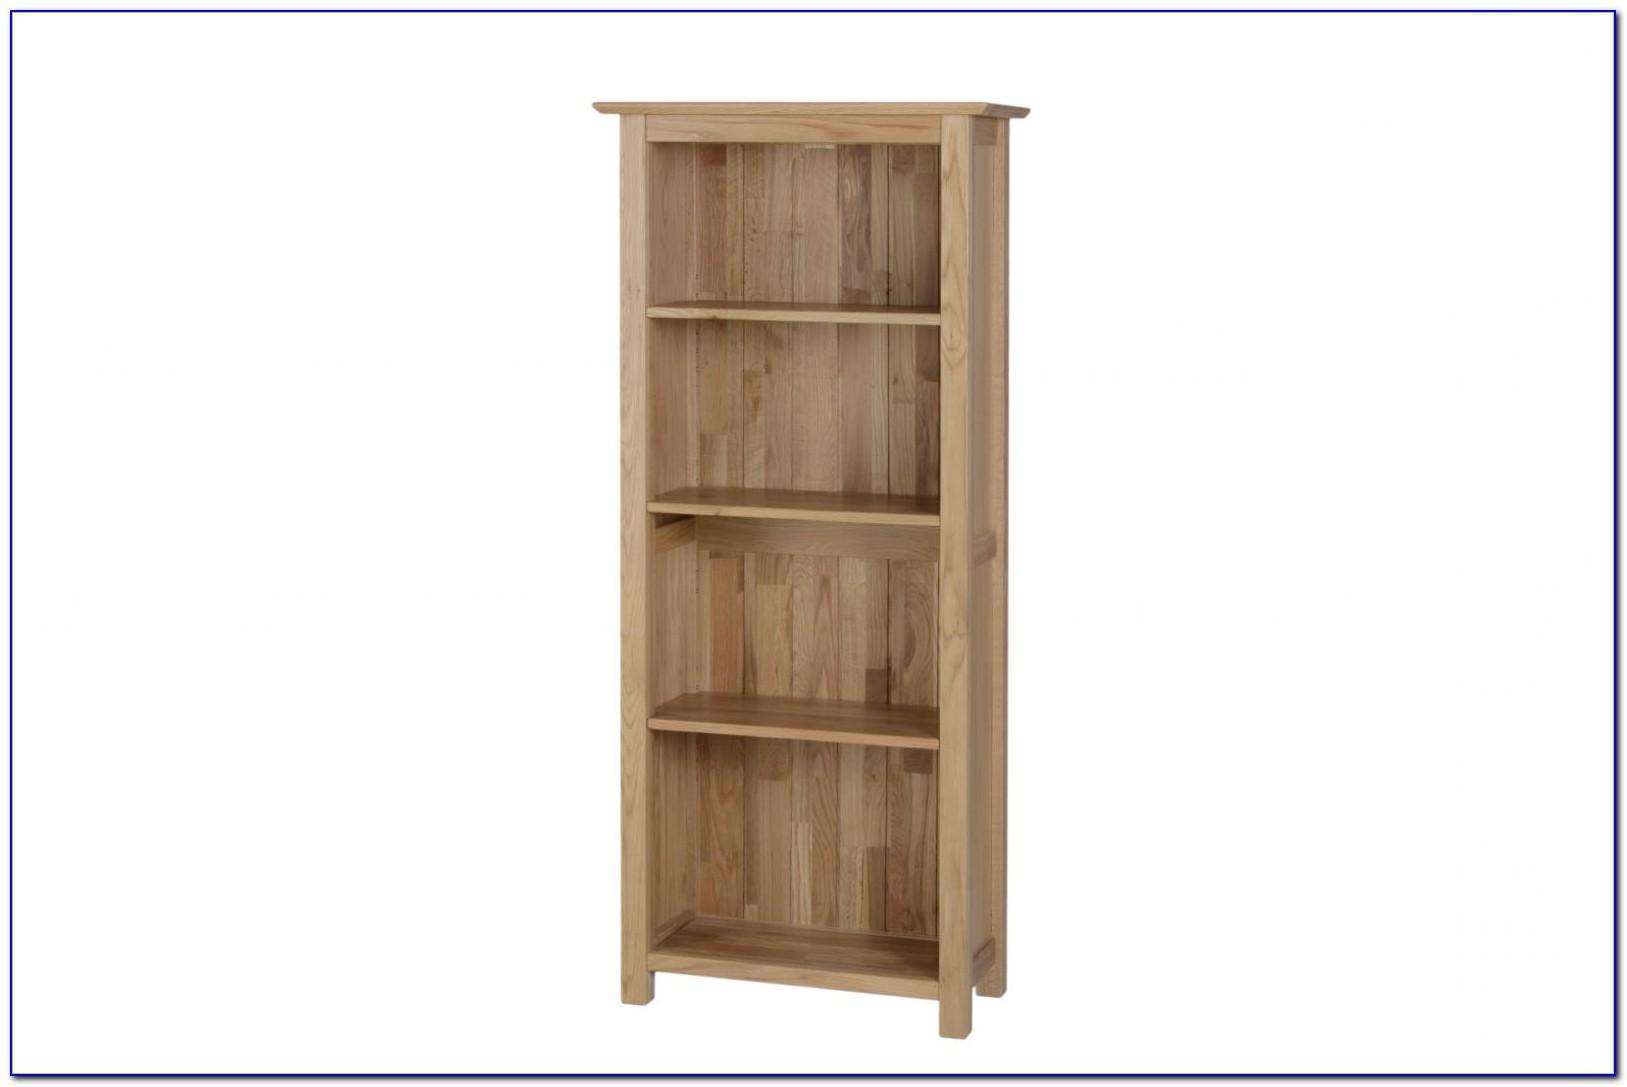 Solid Oak Narrow Bookcase